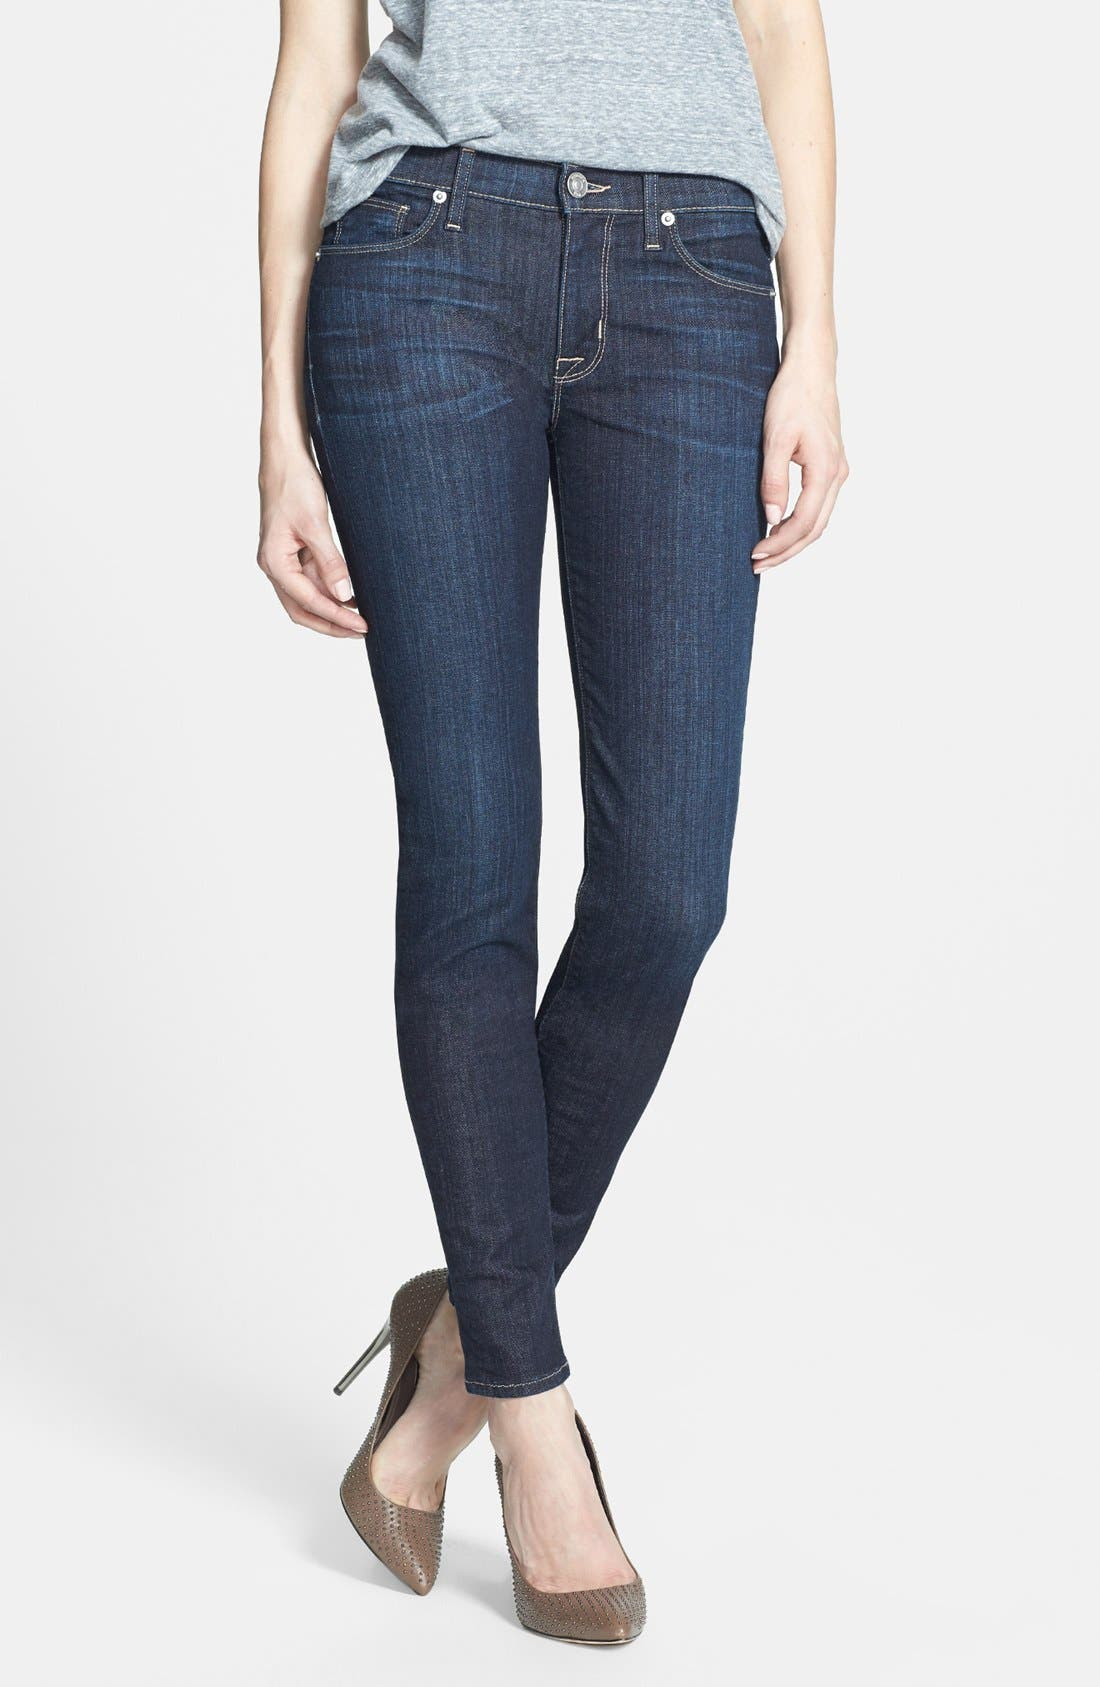 Alternate Image 1 Selected - Hudson Jeans 'Collette' Mid Rise Skinny Jeans (Skyline)